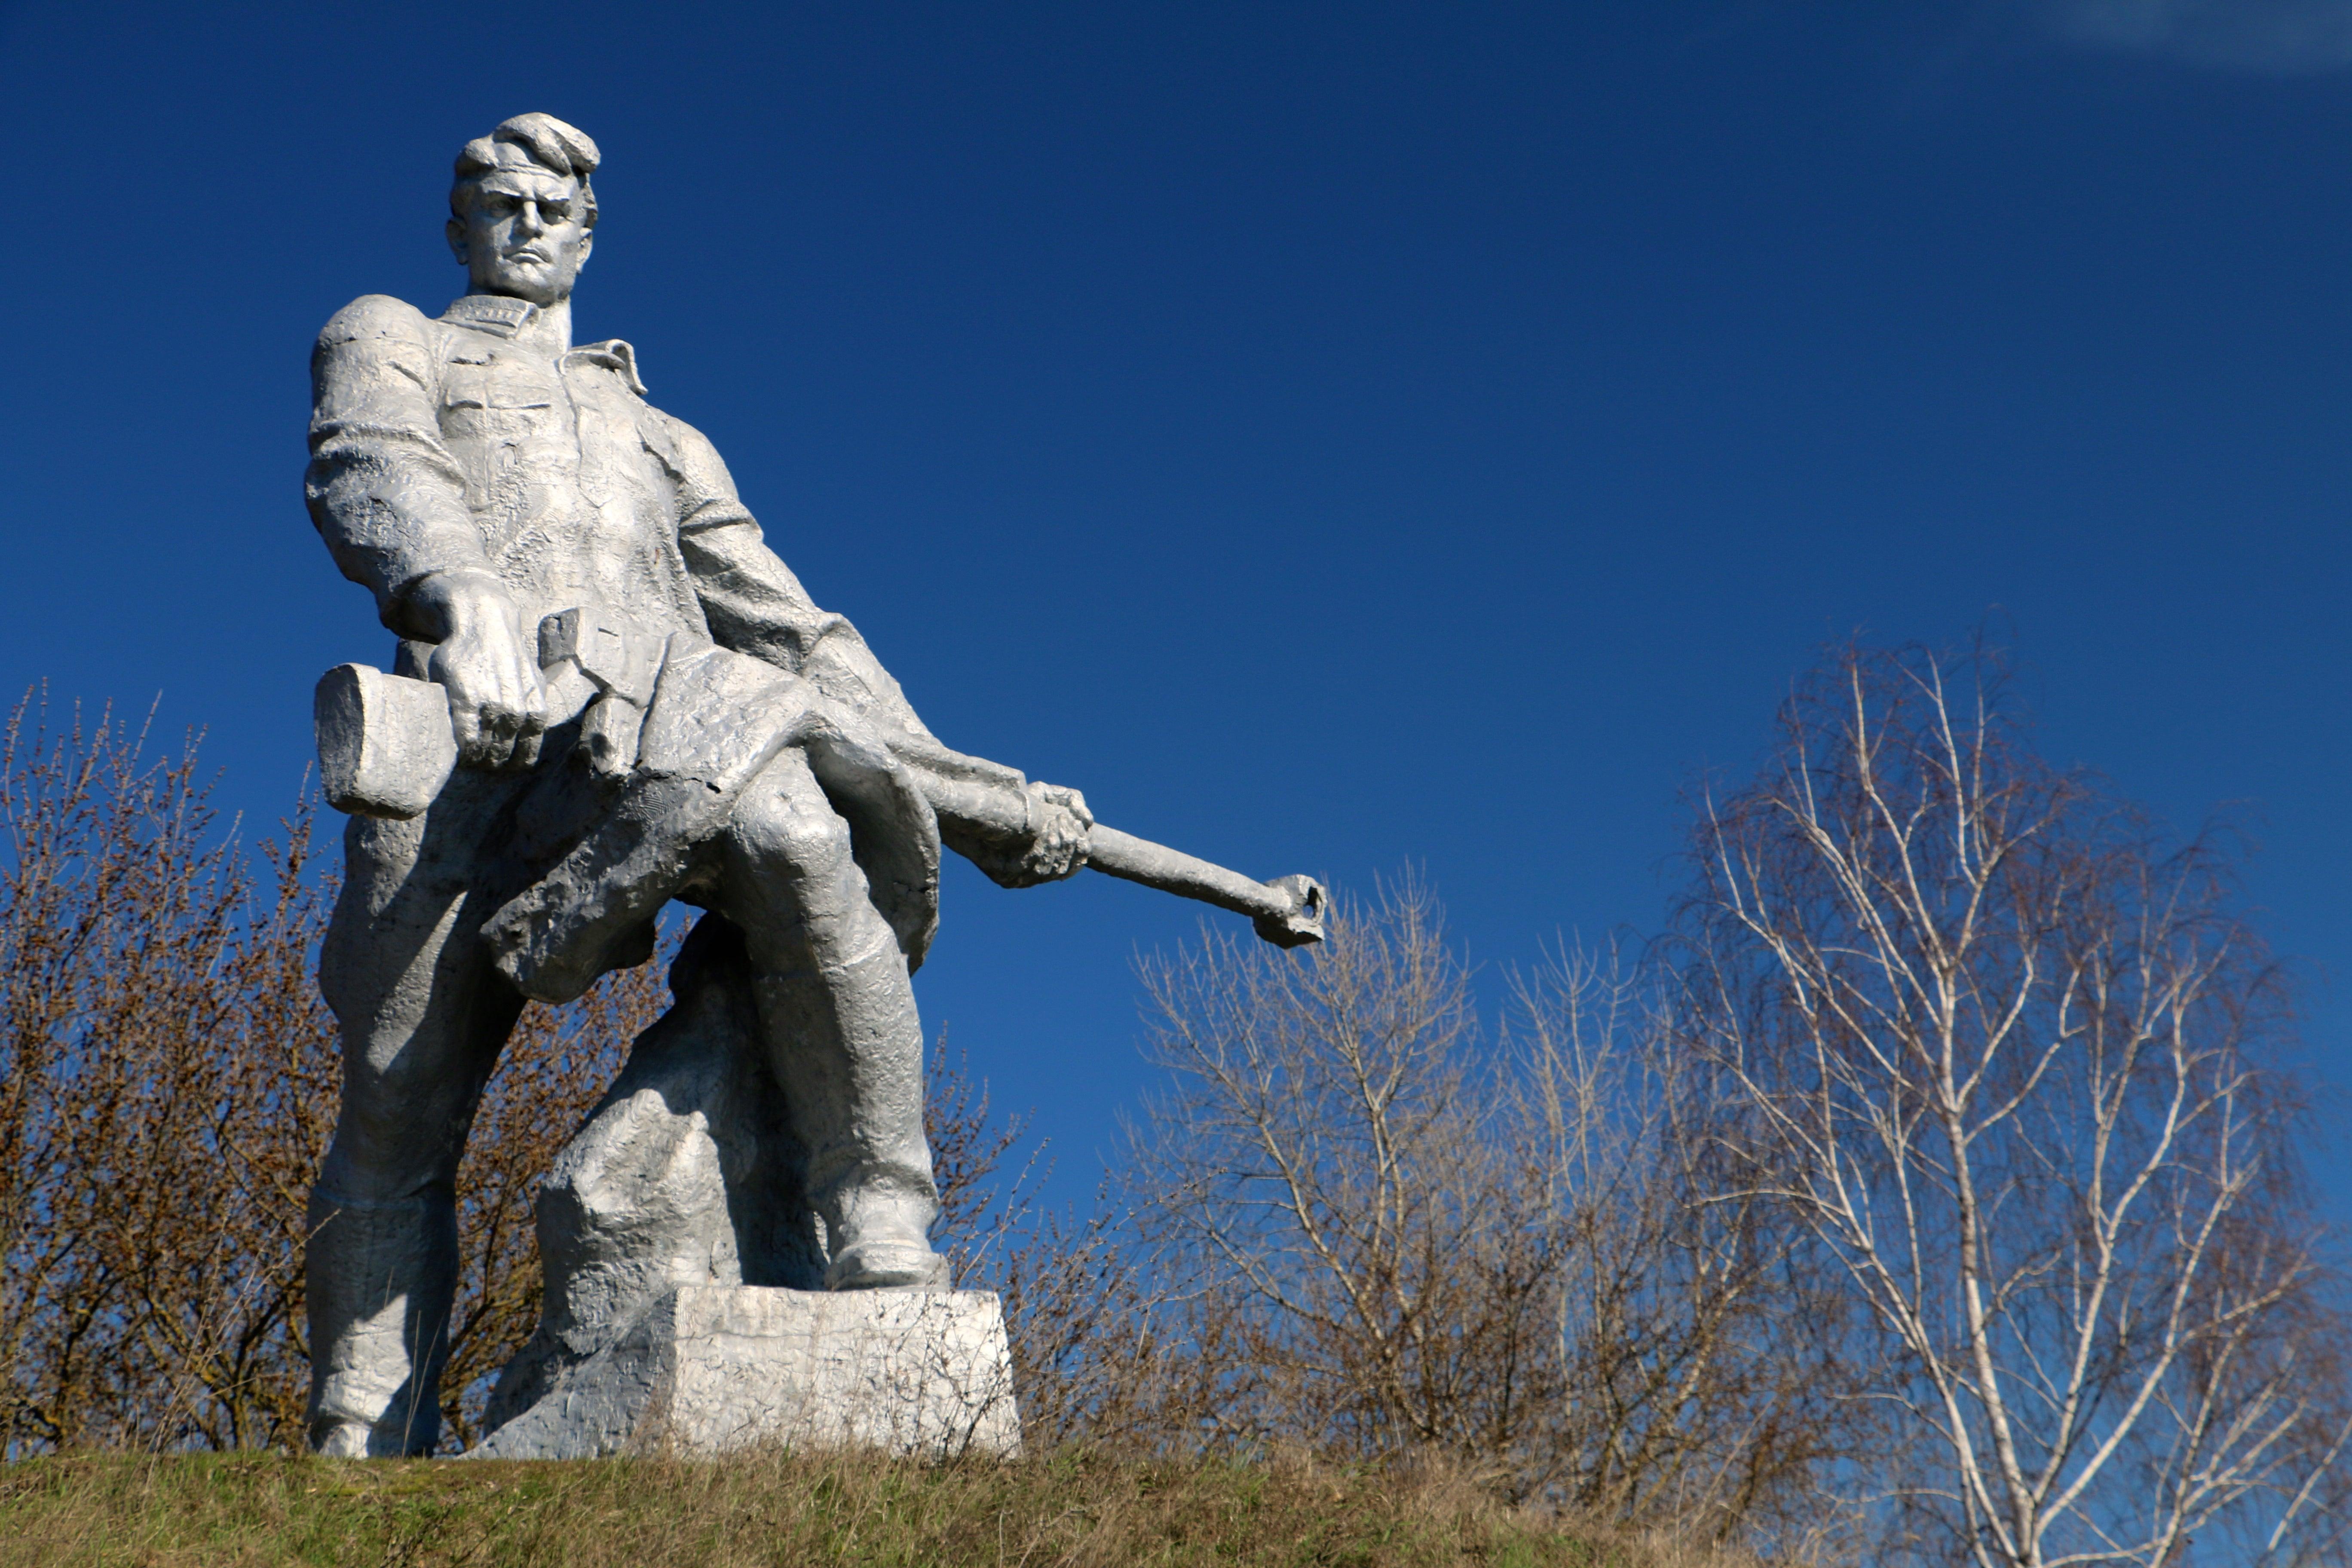 A Soviet World War II memorial outside Kaniv, Ukraine. (Photo: Nolan Peterson/The Daily Signal)